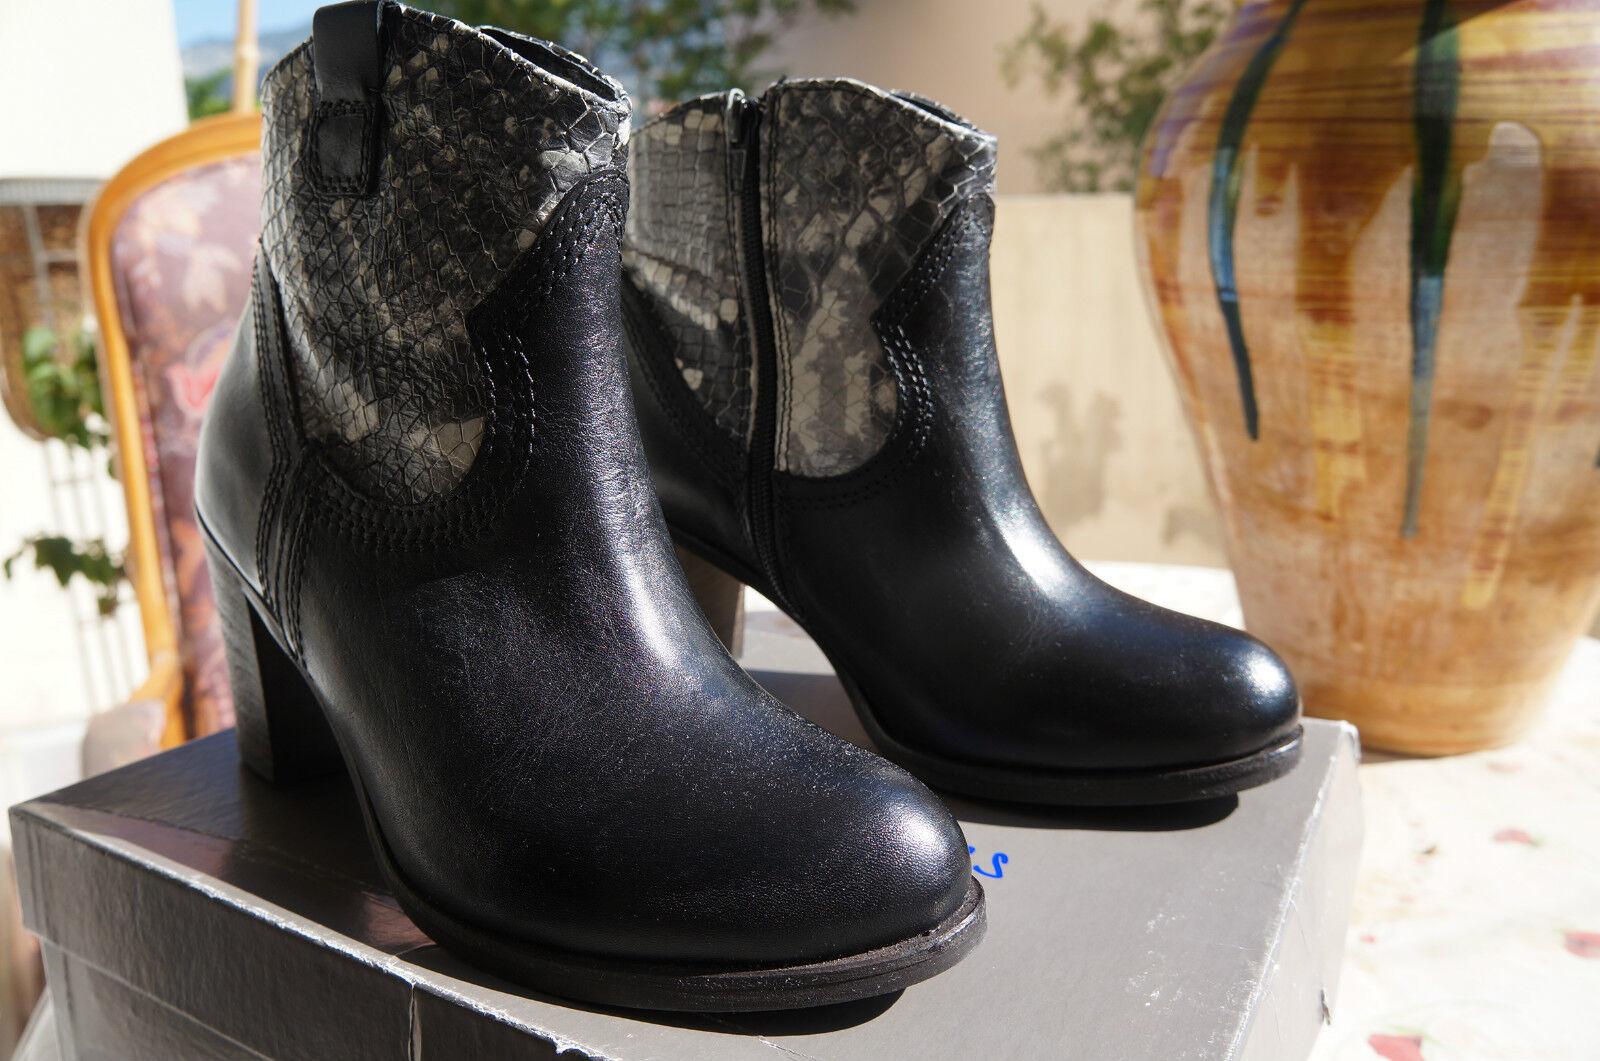 Tosca azul zapatos london, mujer kurzschaft COWBOYbotas, negro, 39 e -